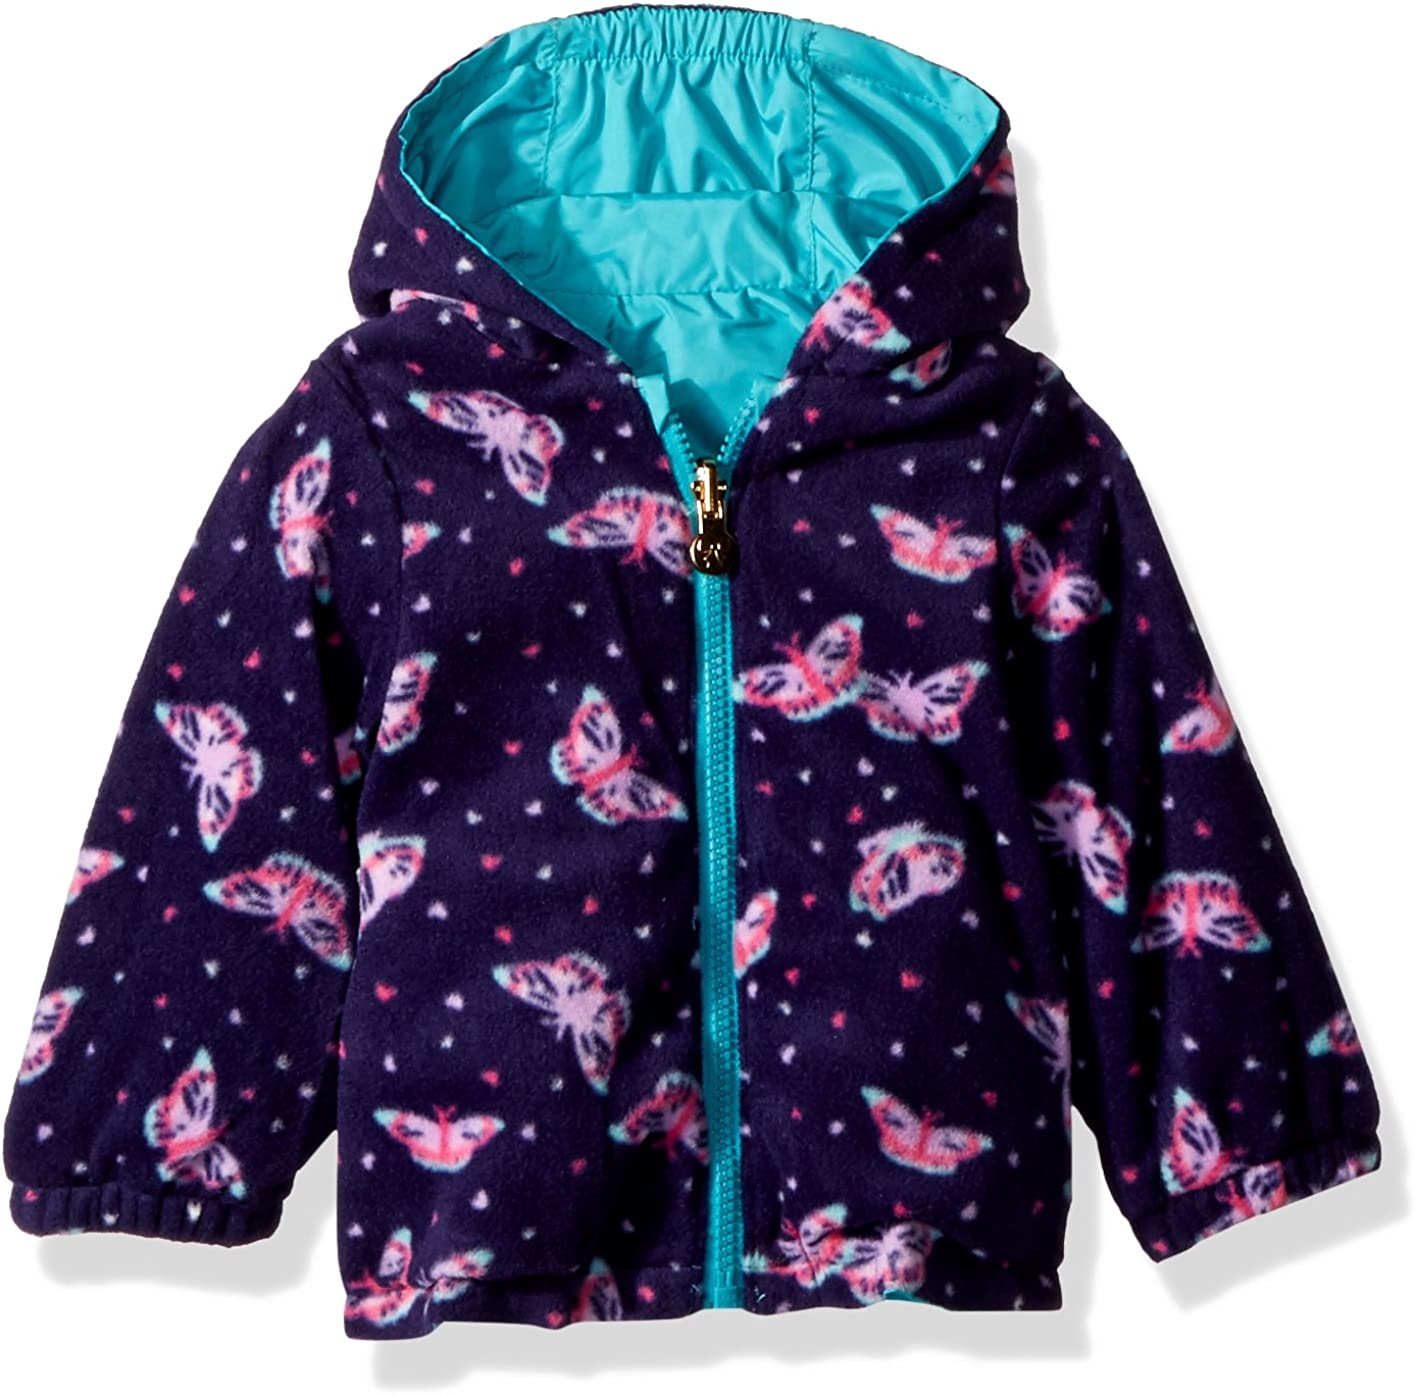 London Fog Baby Girls Reversible Sensible /& Soft Jacket Coat